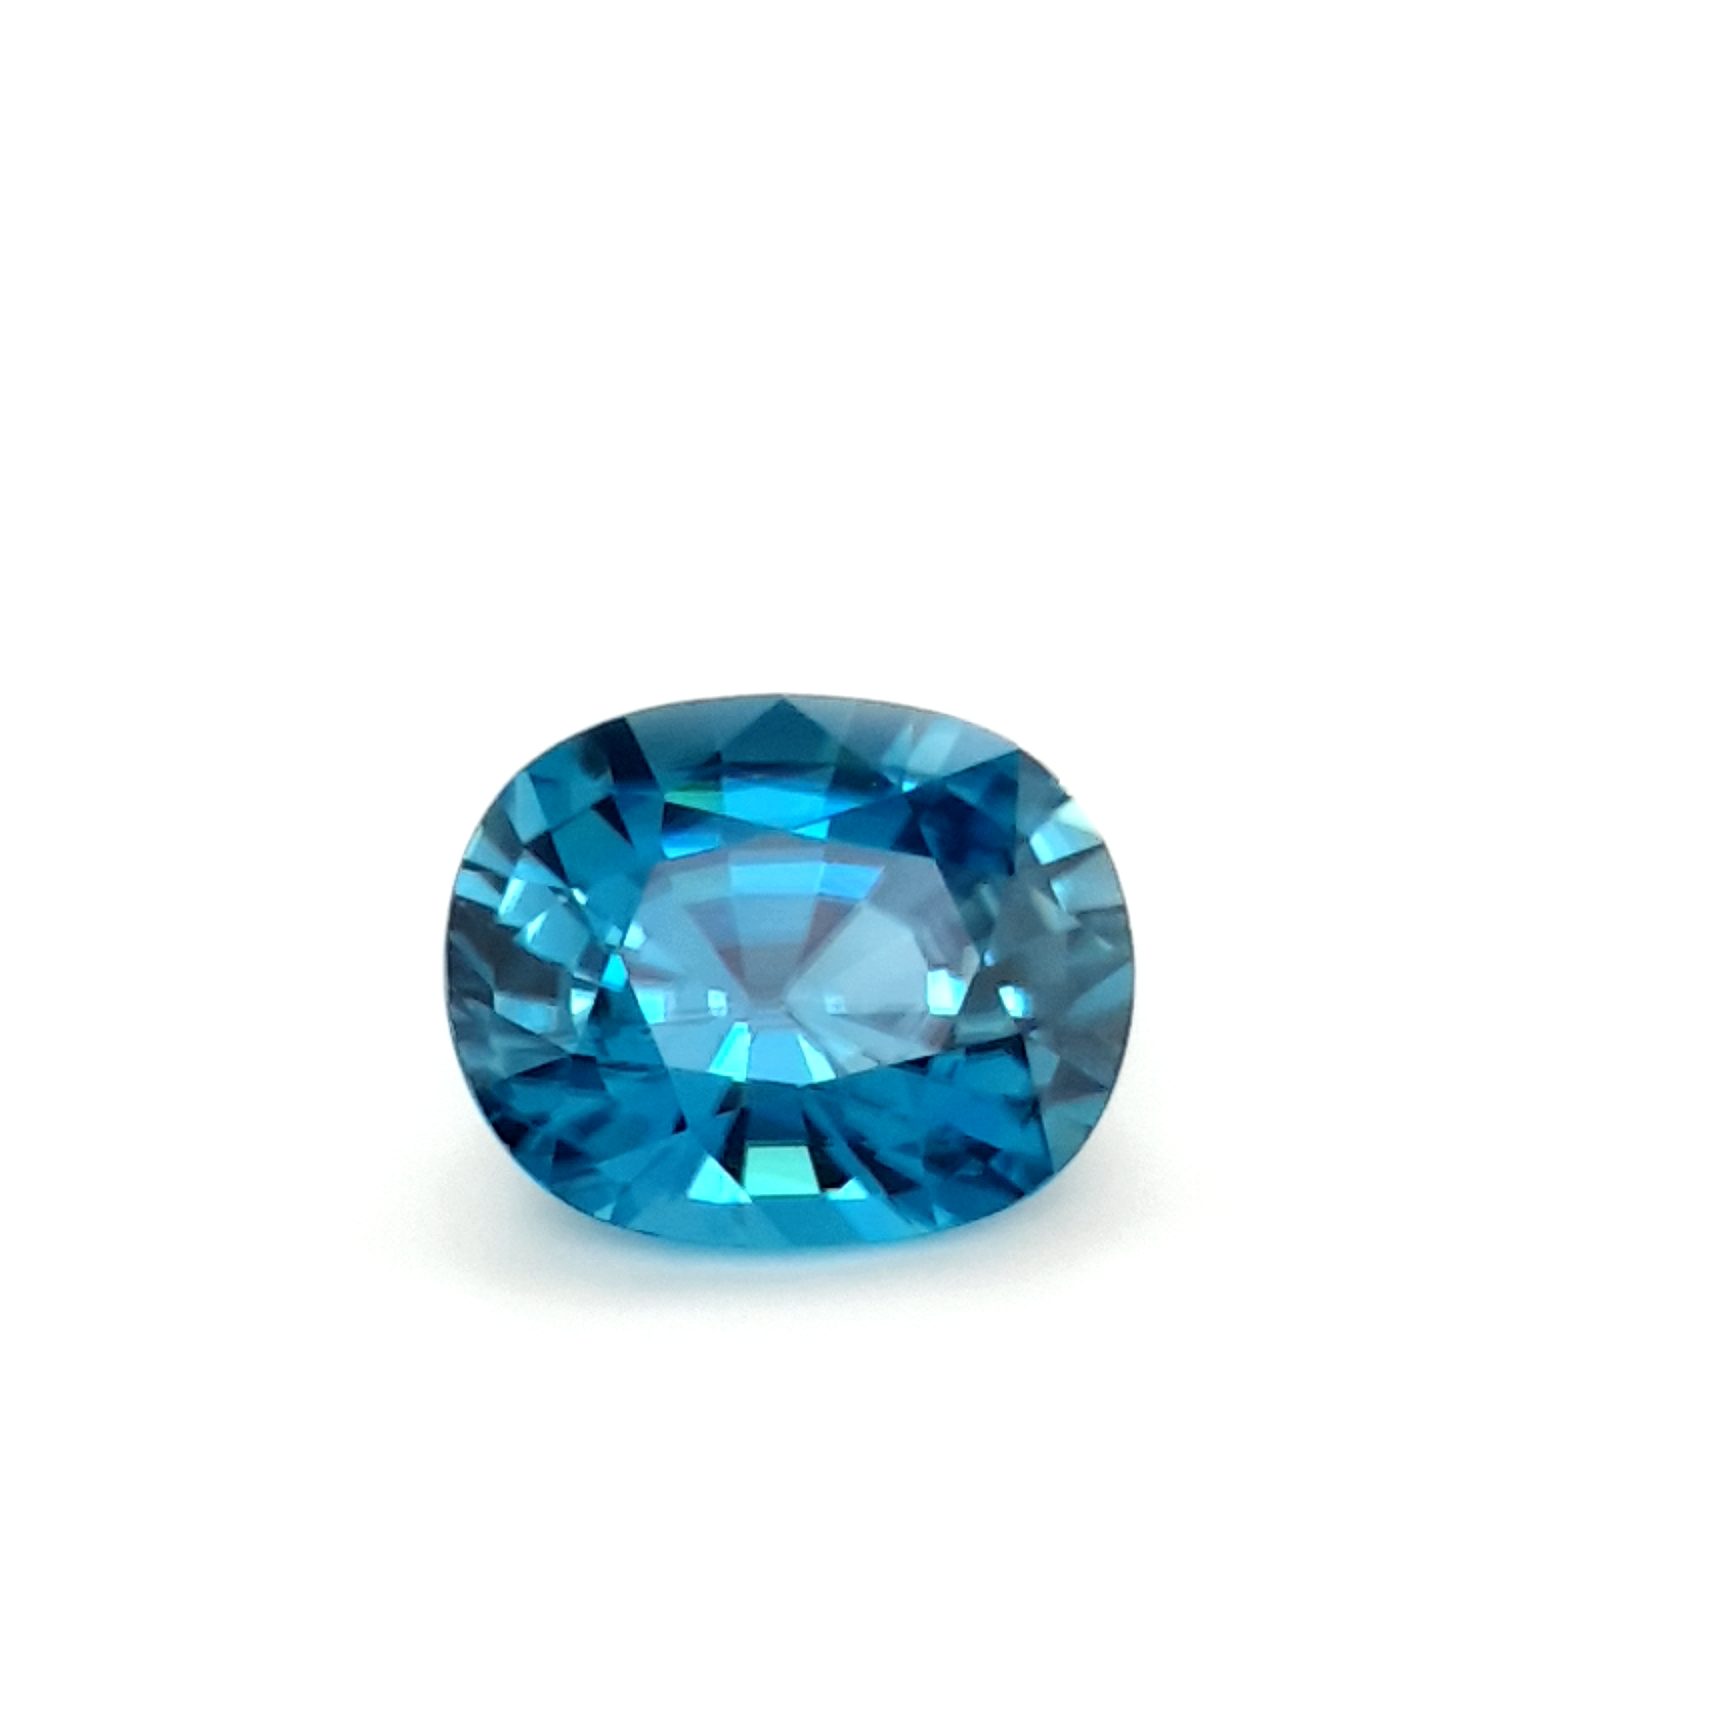 12,48ct. Starlight Blue Zircon ZCK16D7 ClaudiaHamann